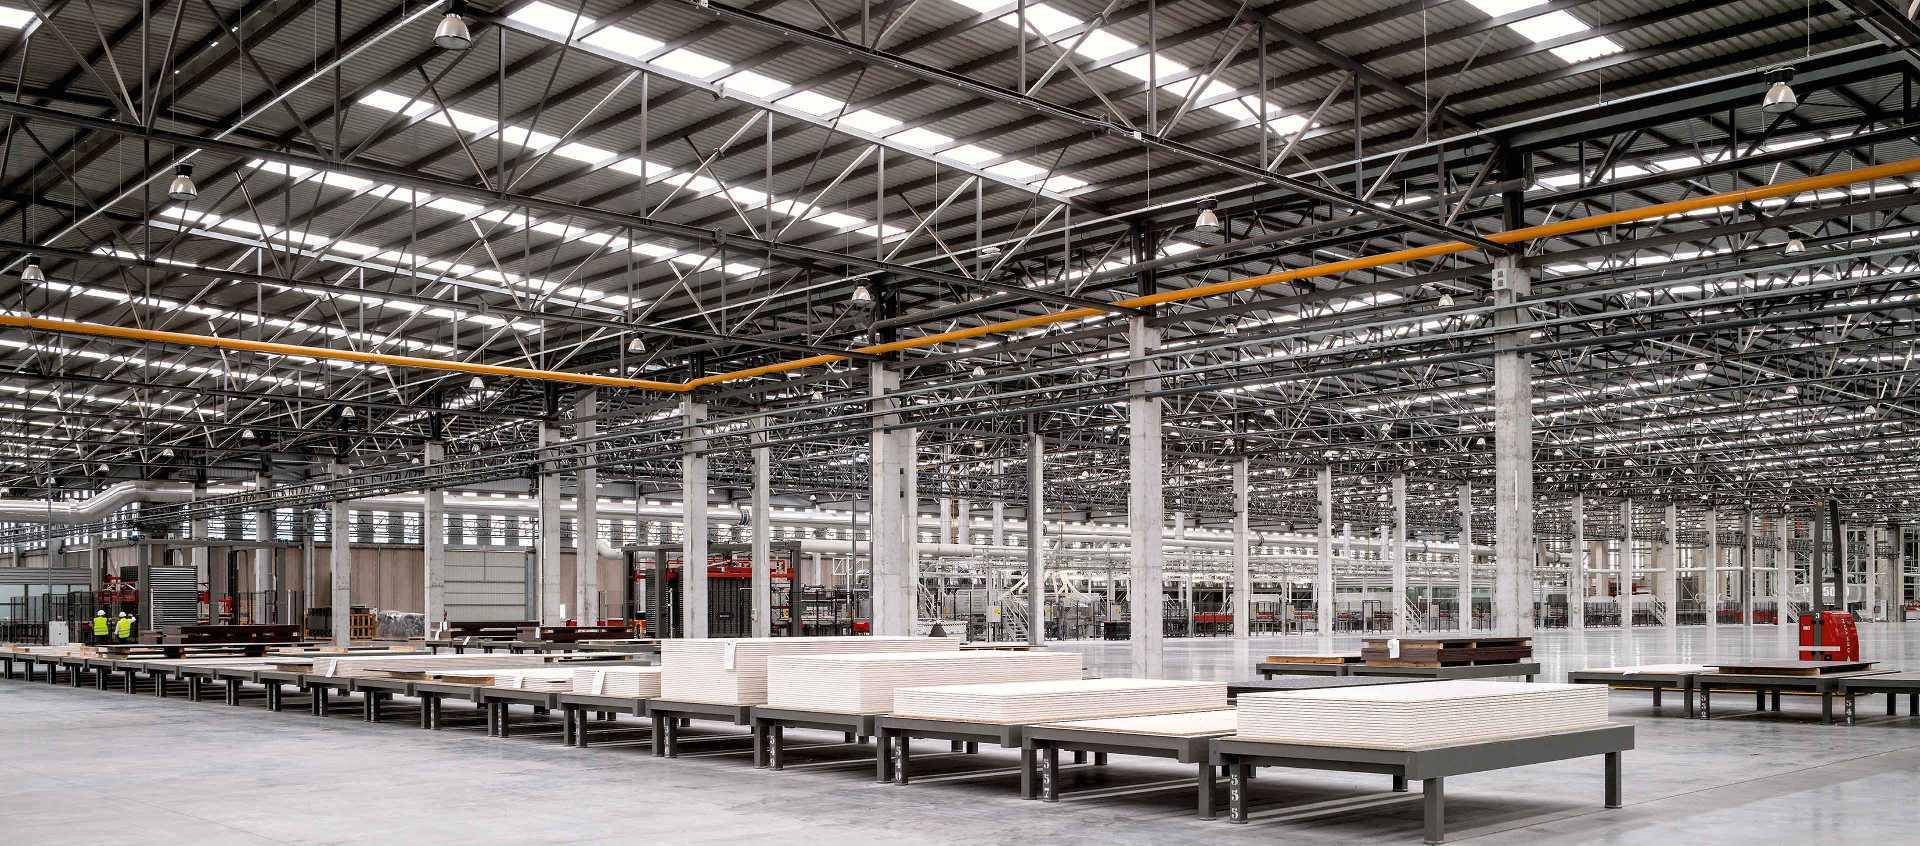 Dekton, a New Building Material  - 10 08 44